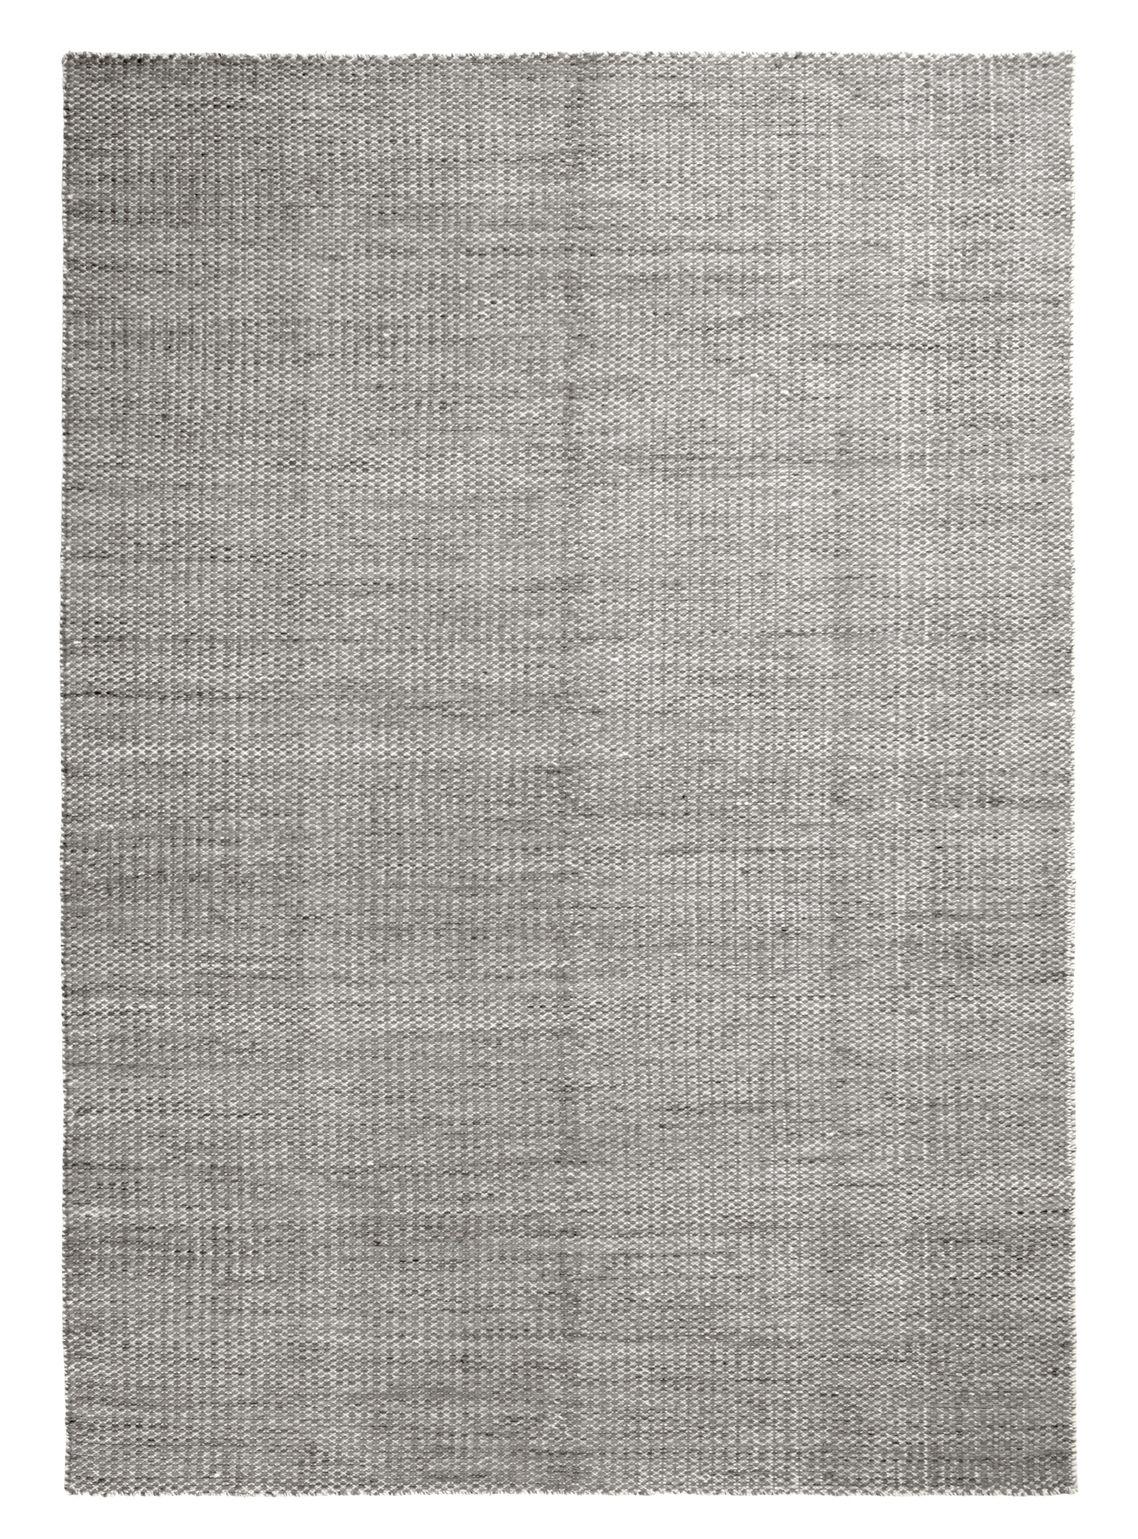 Decoration - Rugs - Moiré Kelim Large Rug - / Handwoven - 300 x 200 cm by Hay - Grey - Wool